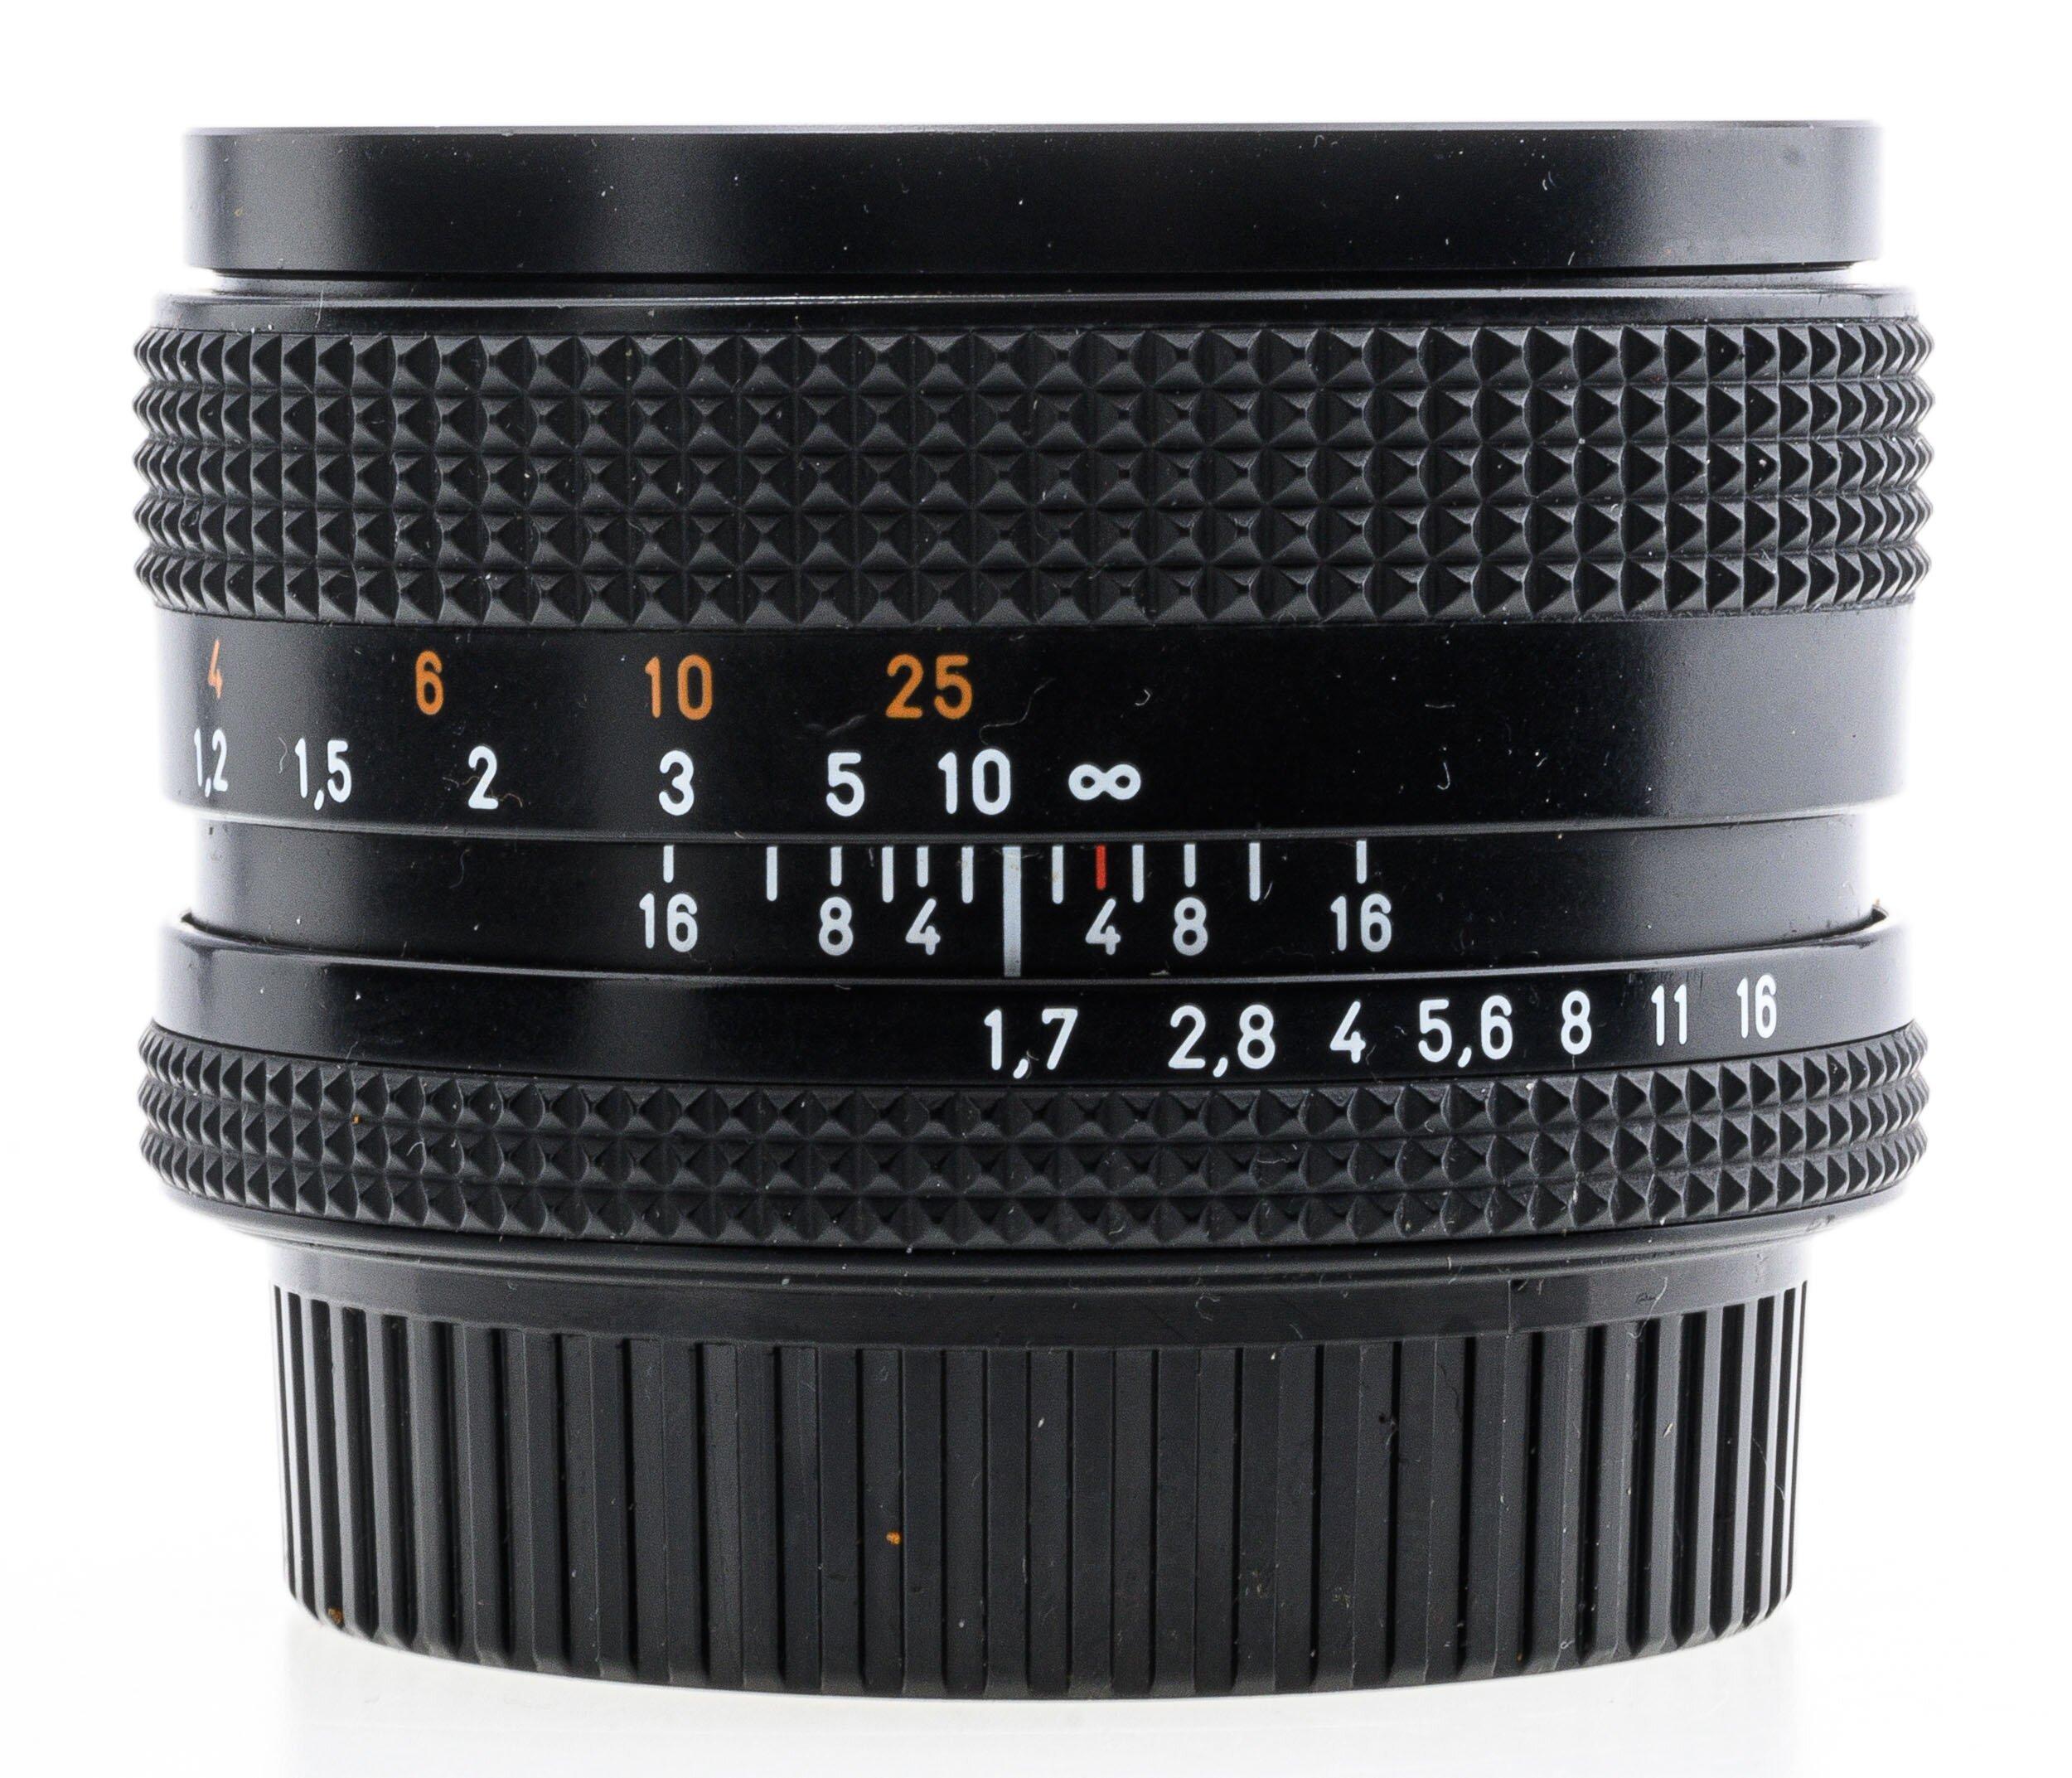 Contax Planar 1,7/50mm